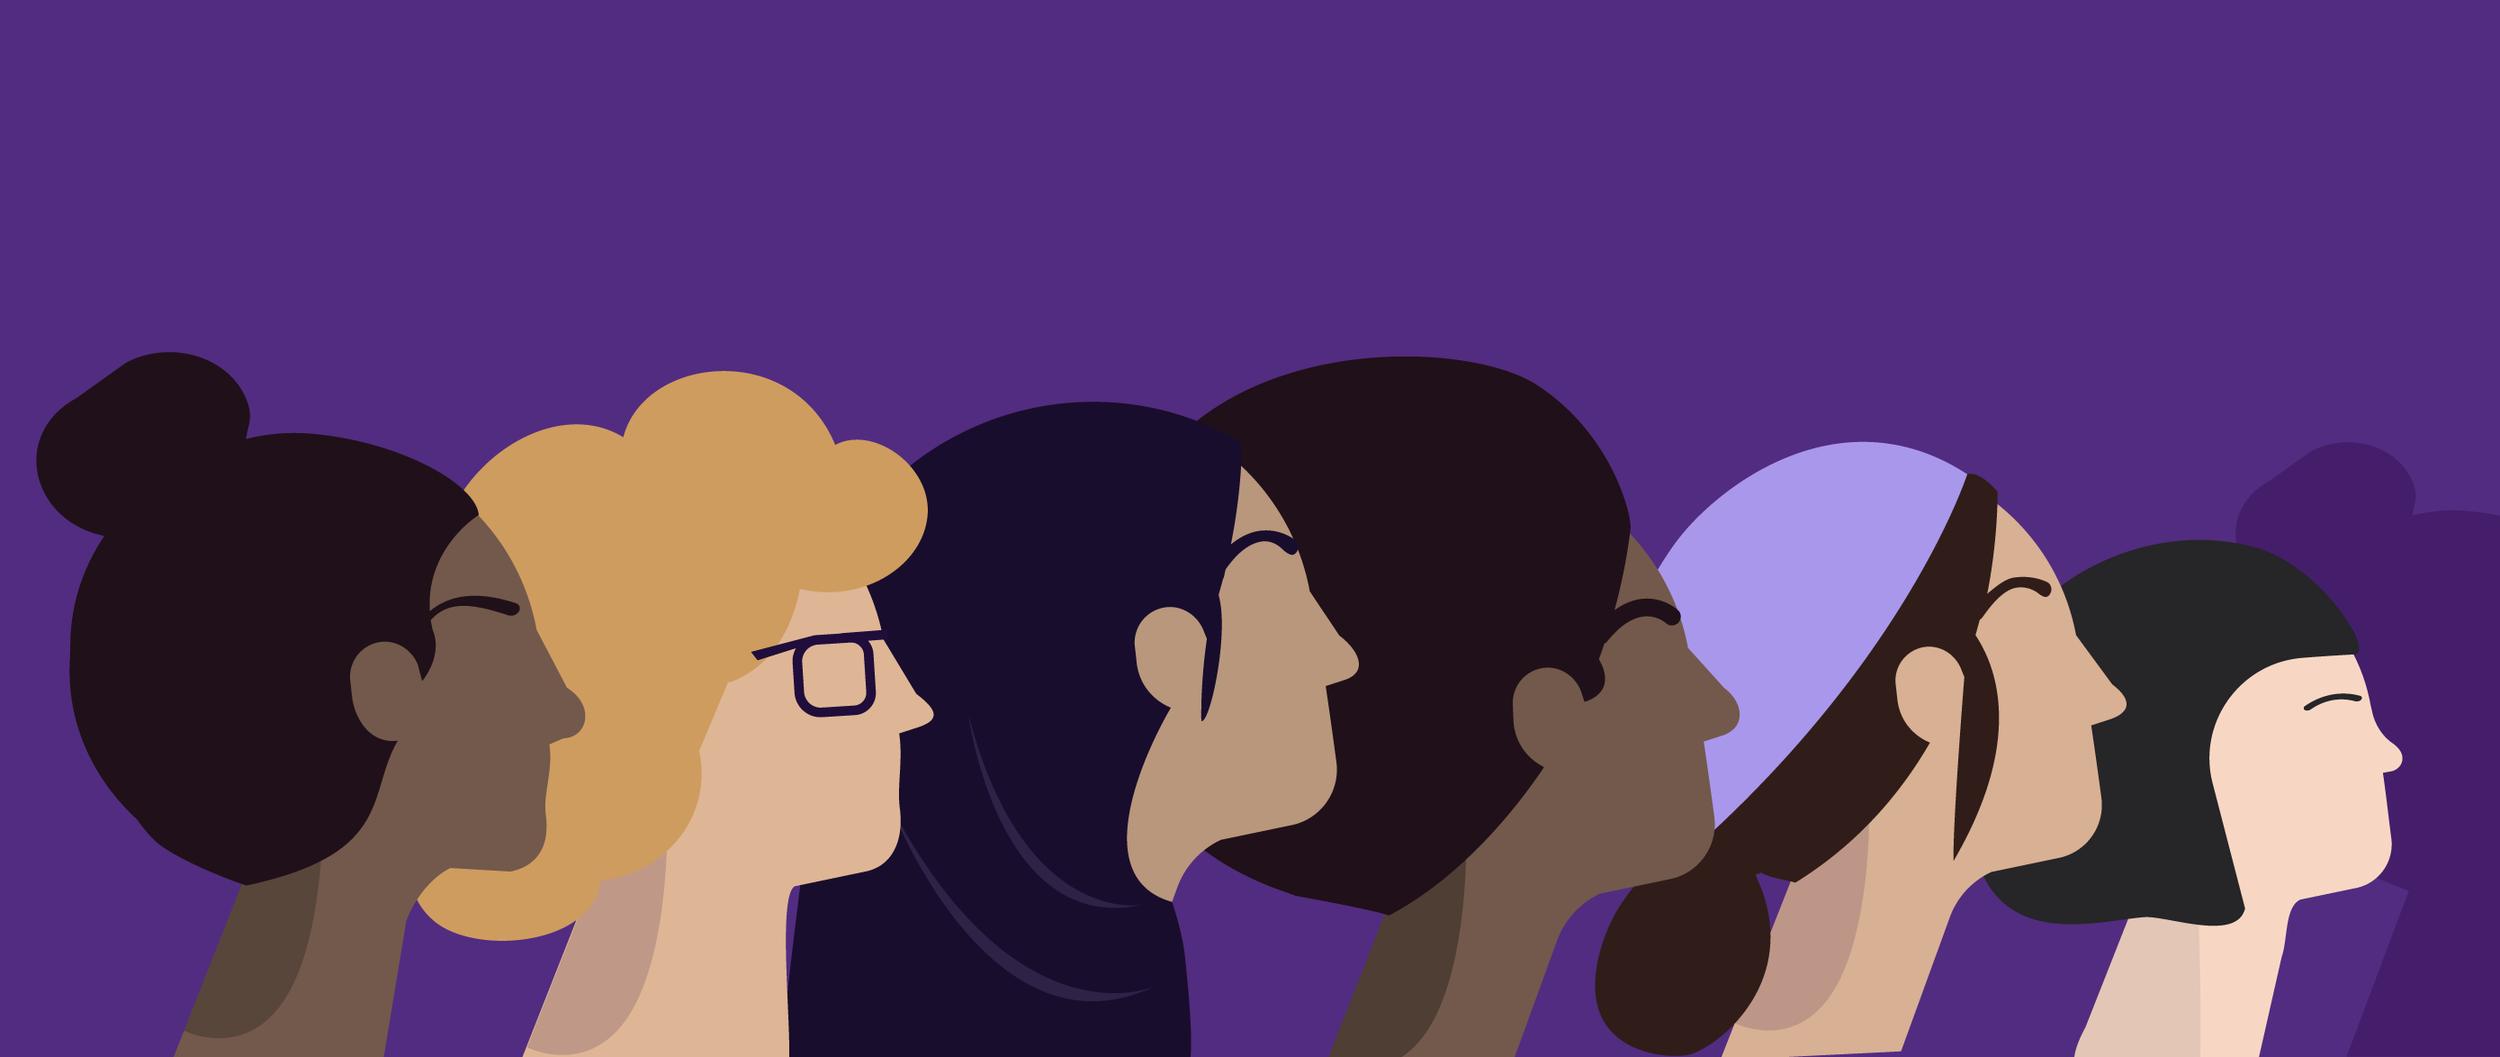 International Women's Day | Microsoft - Illustration | Art Direction